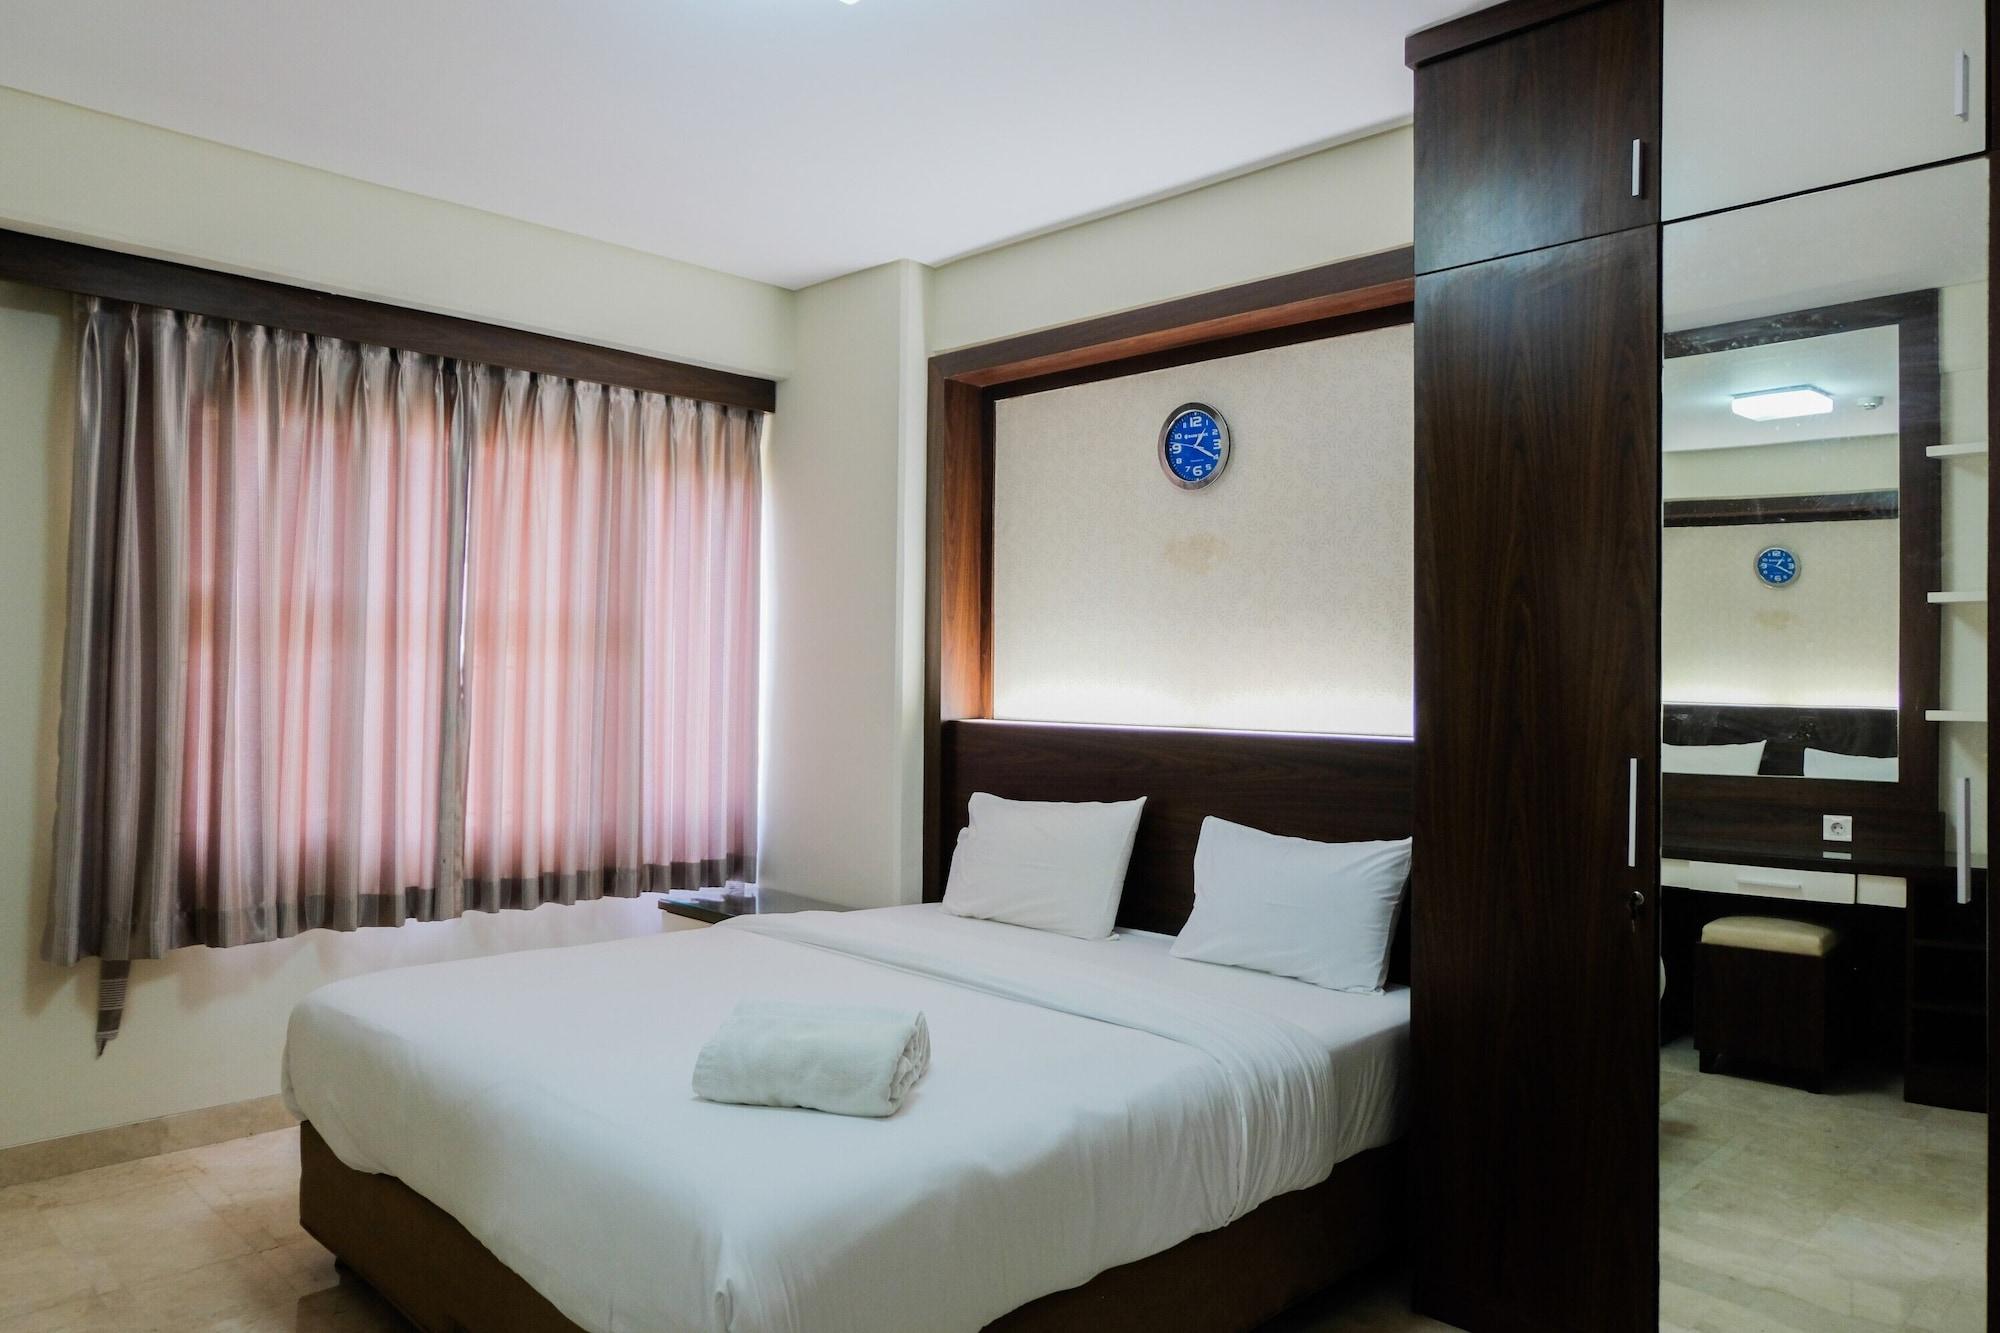 Homey and Relaxing 2BR @ Kondominium Golf Karawaci Apartment, Tangerang